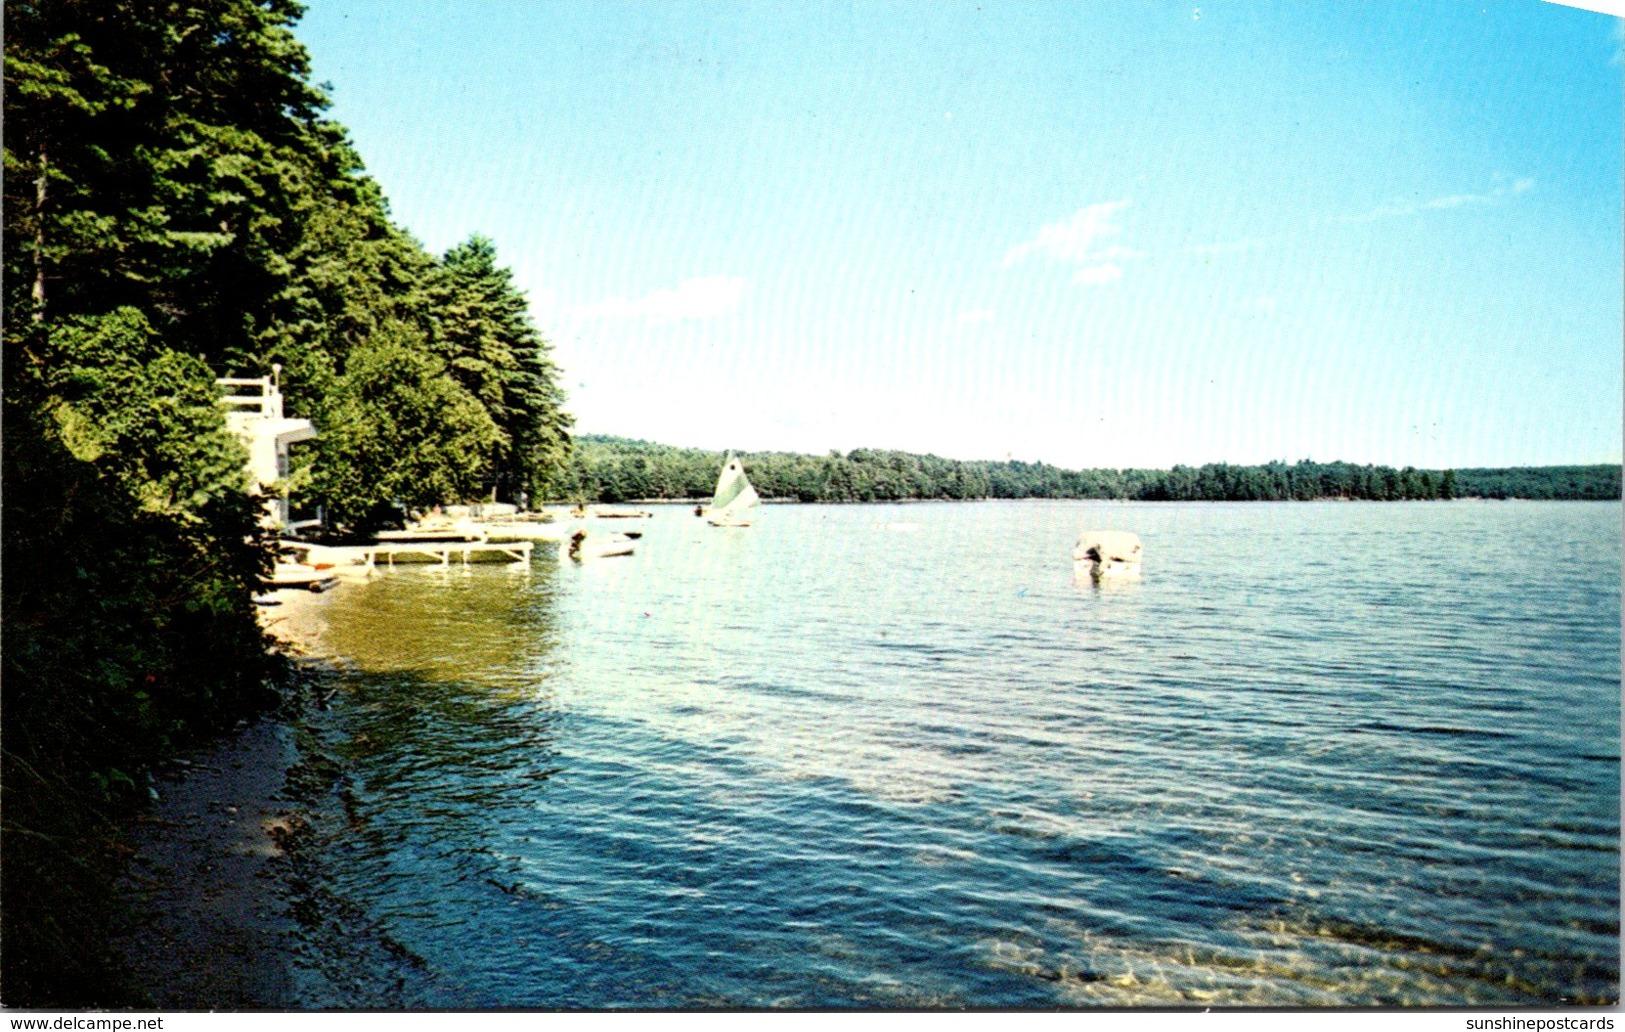 Maine Great East Lake